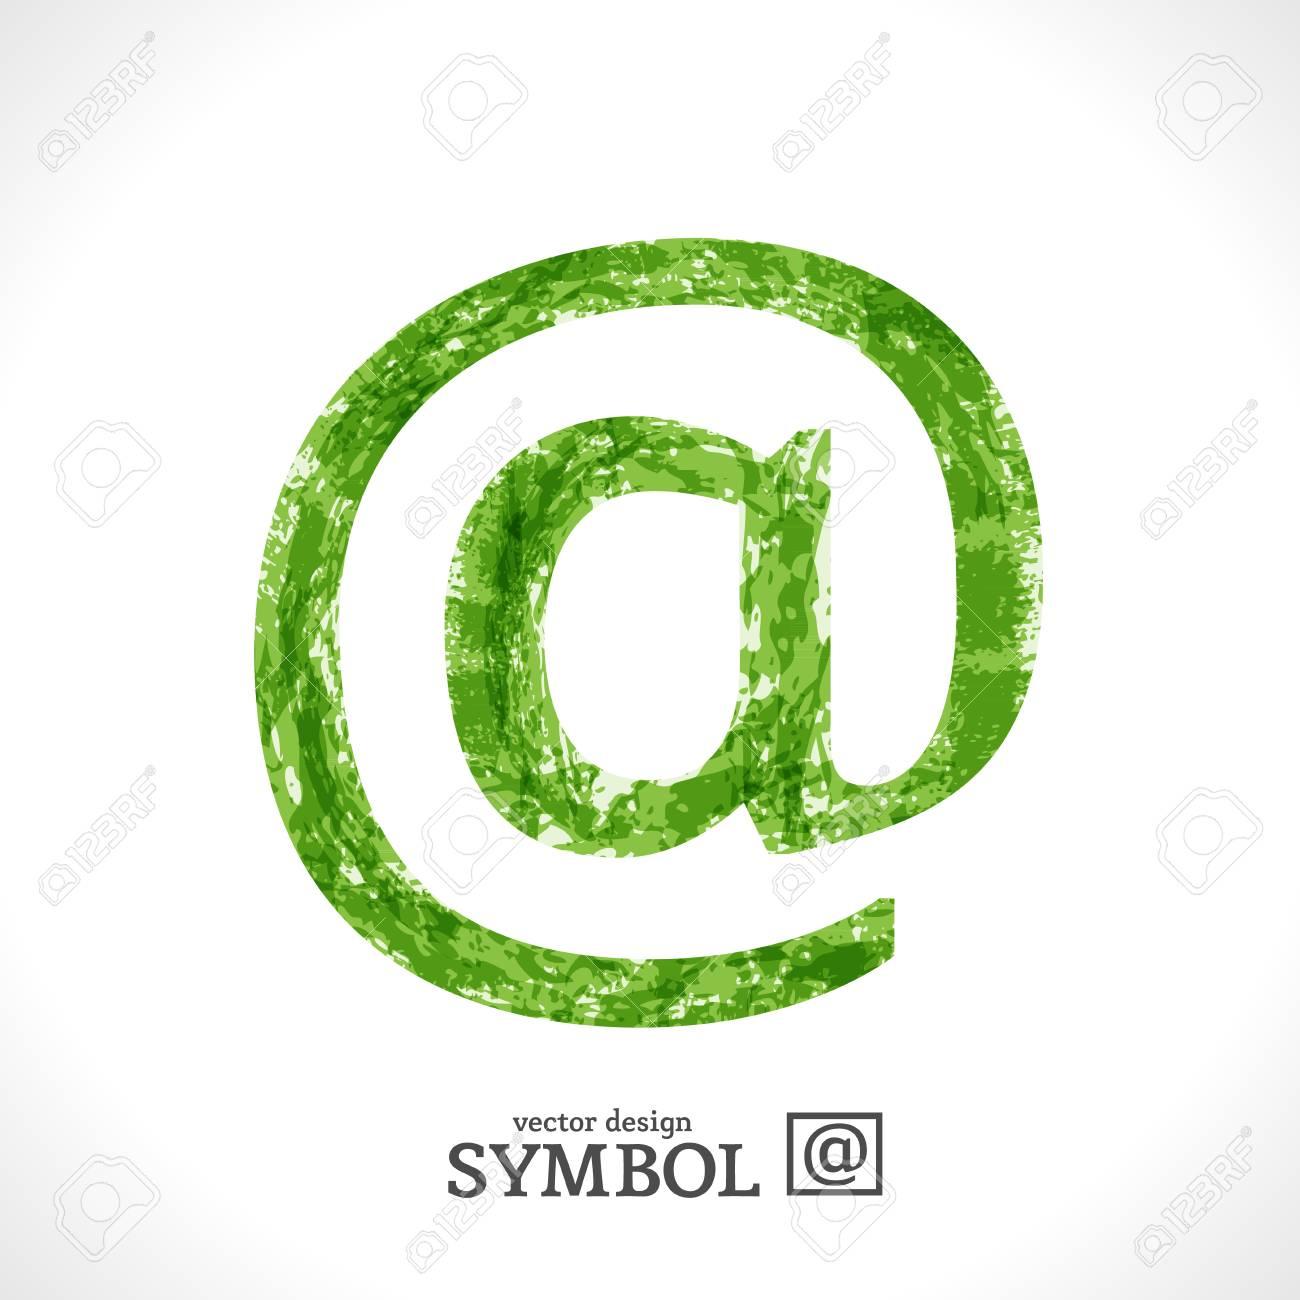 Grunge Symbol. Green Eco Style. @. Stock Vector - 17585045